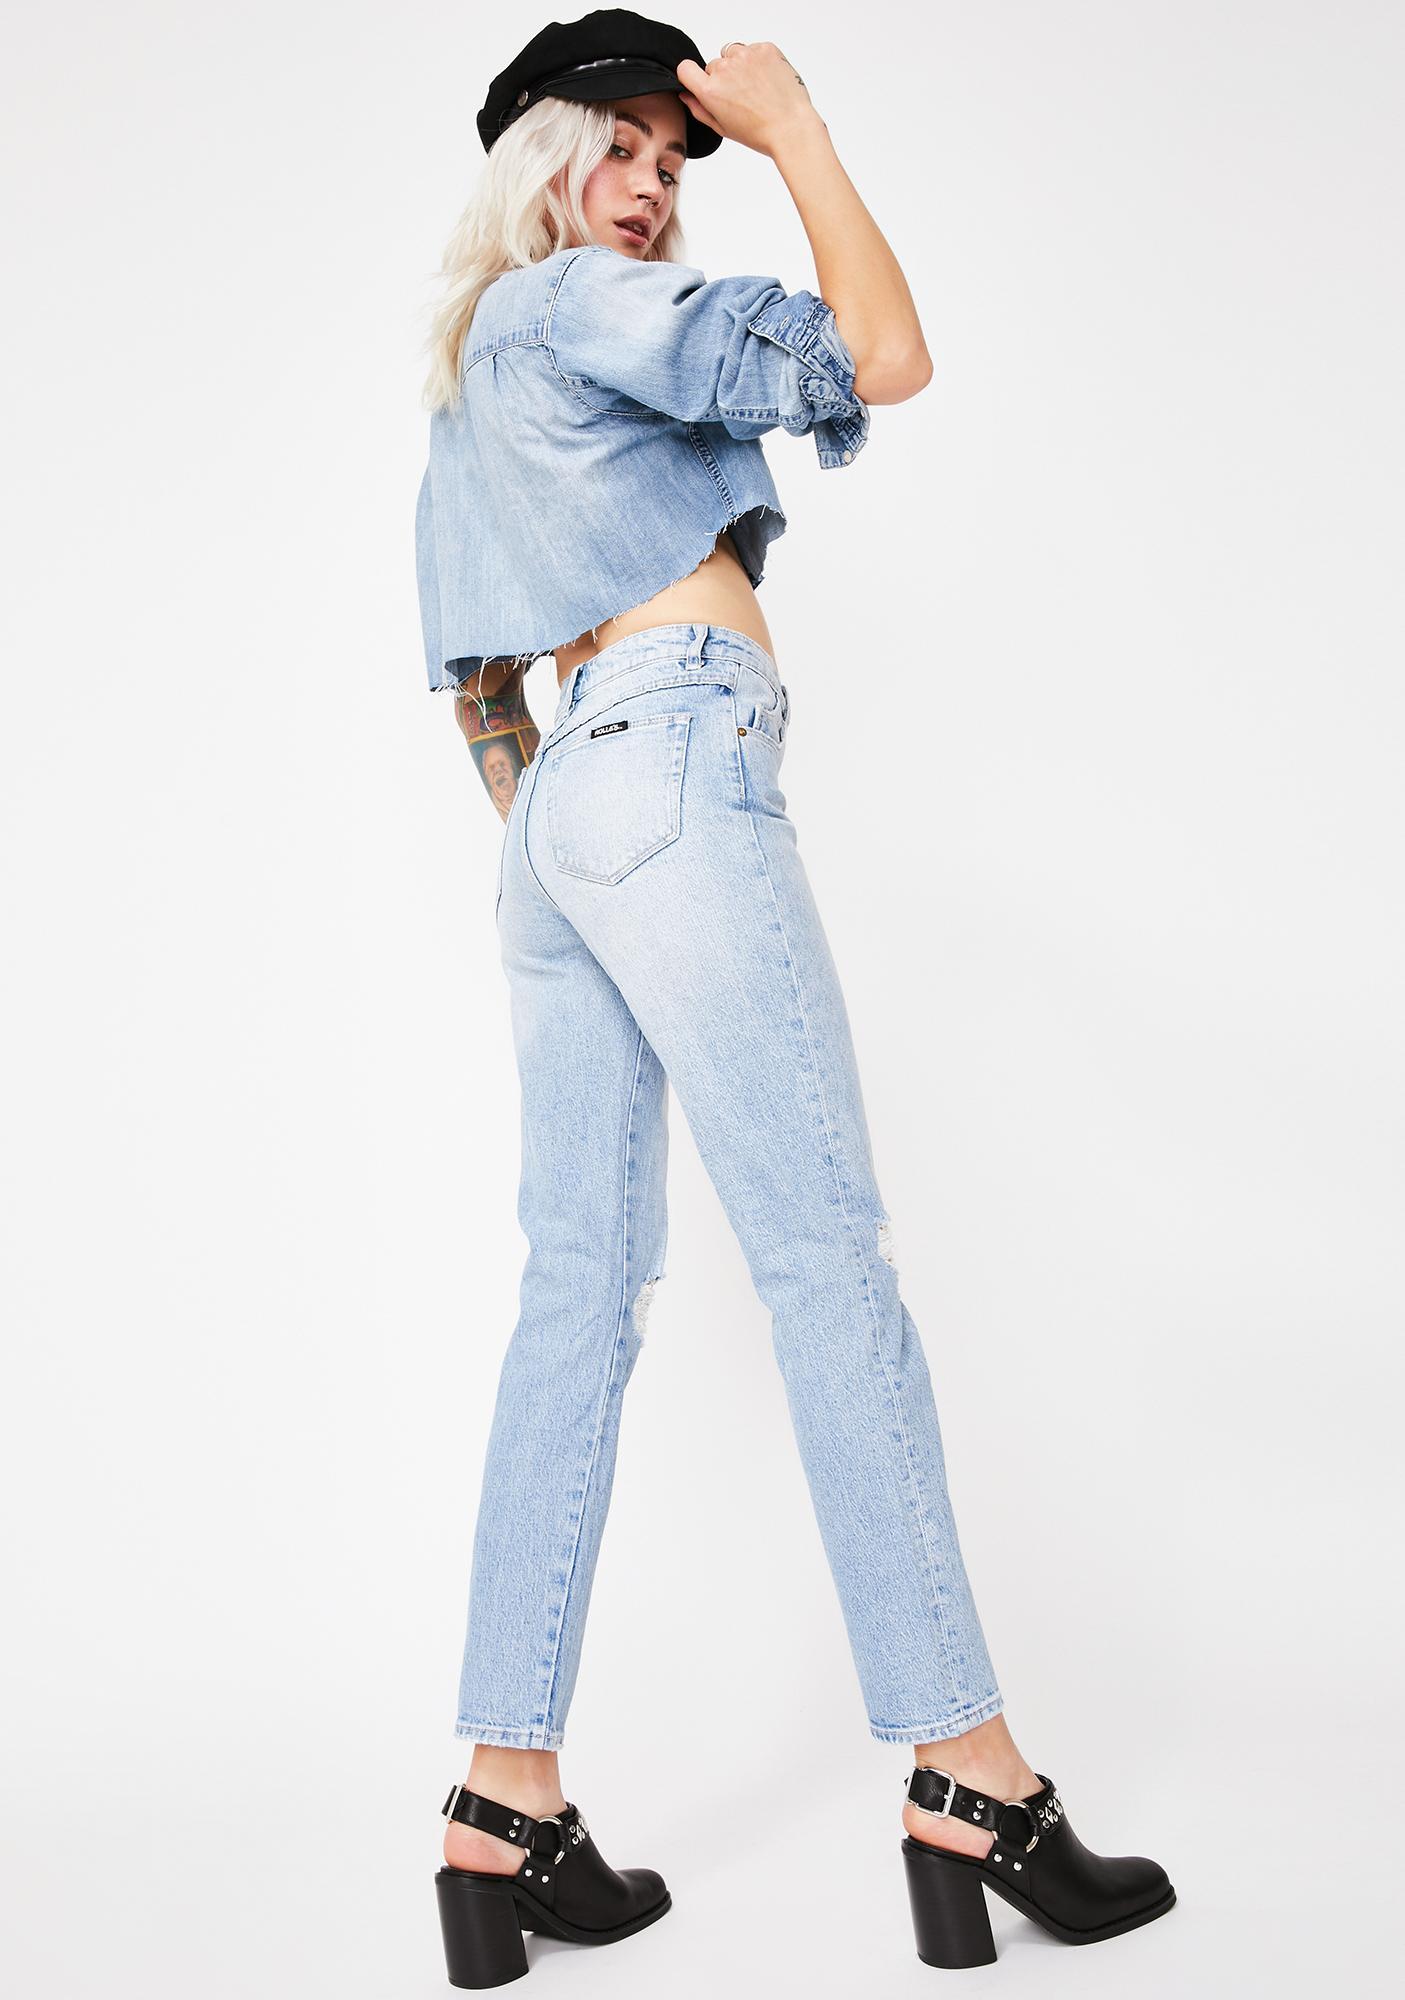 Rollas Faded Vintage Miller Skinny Jeans